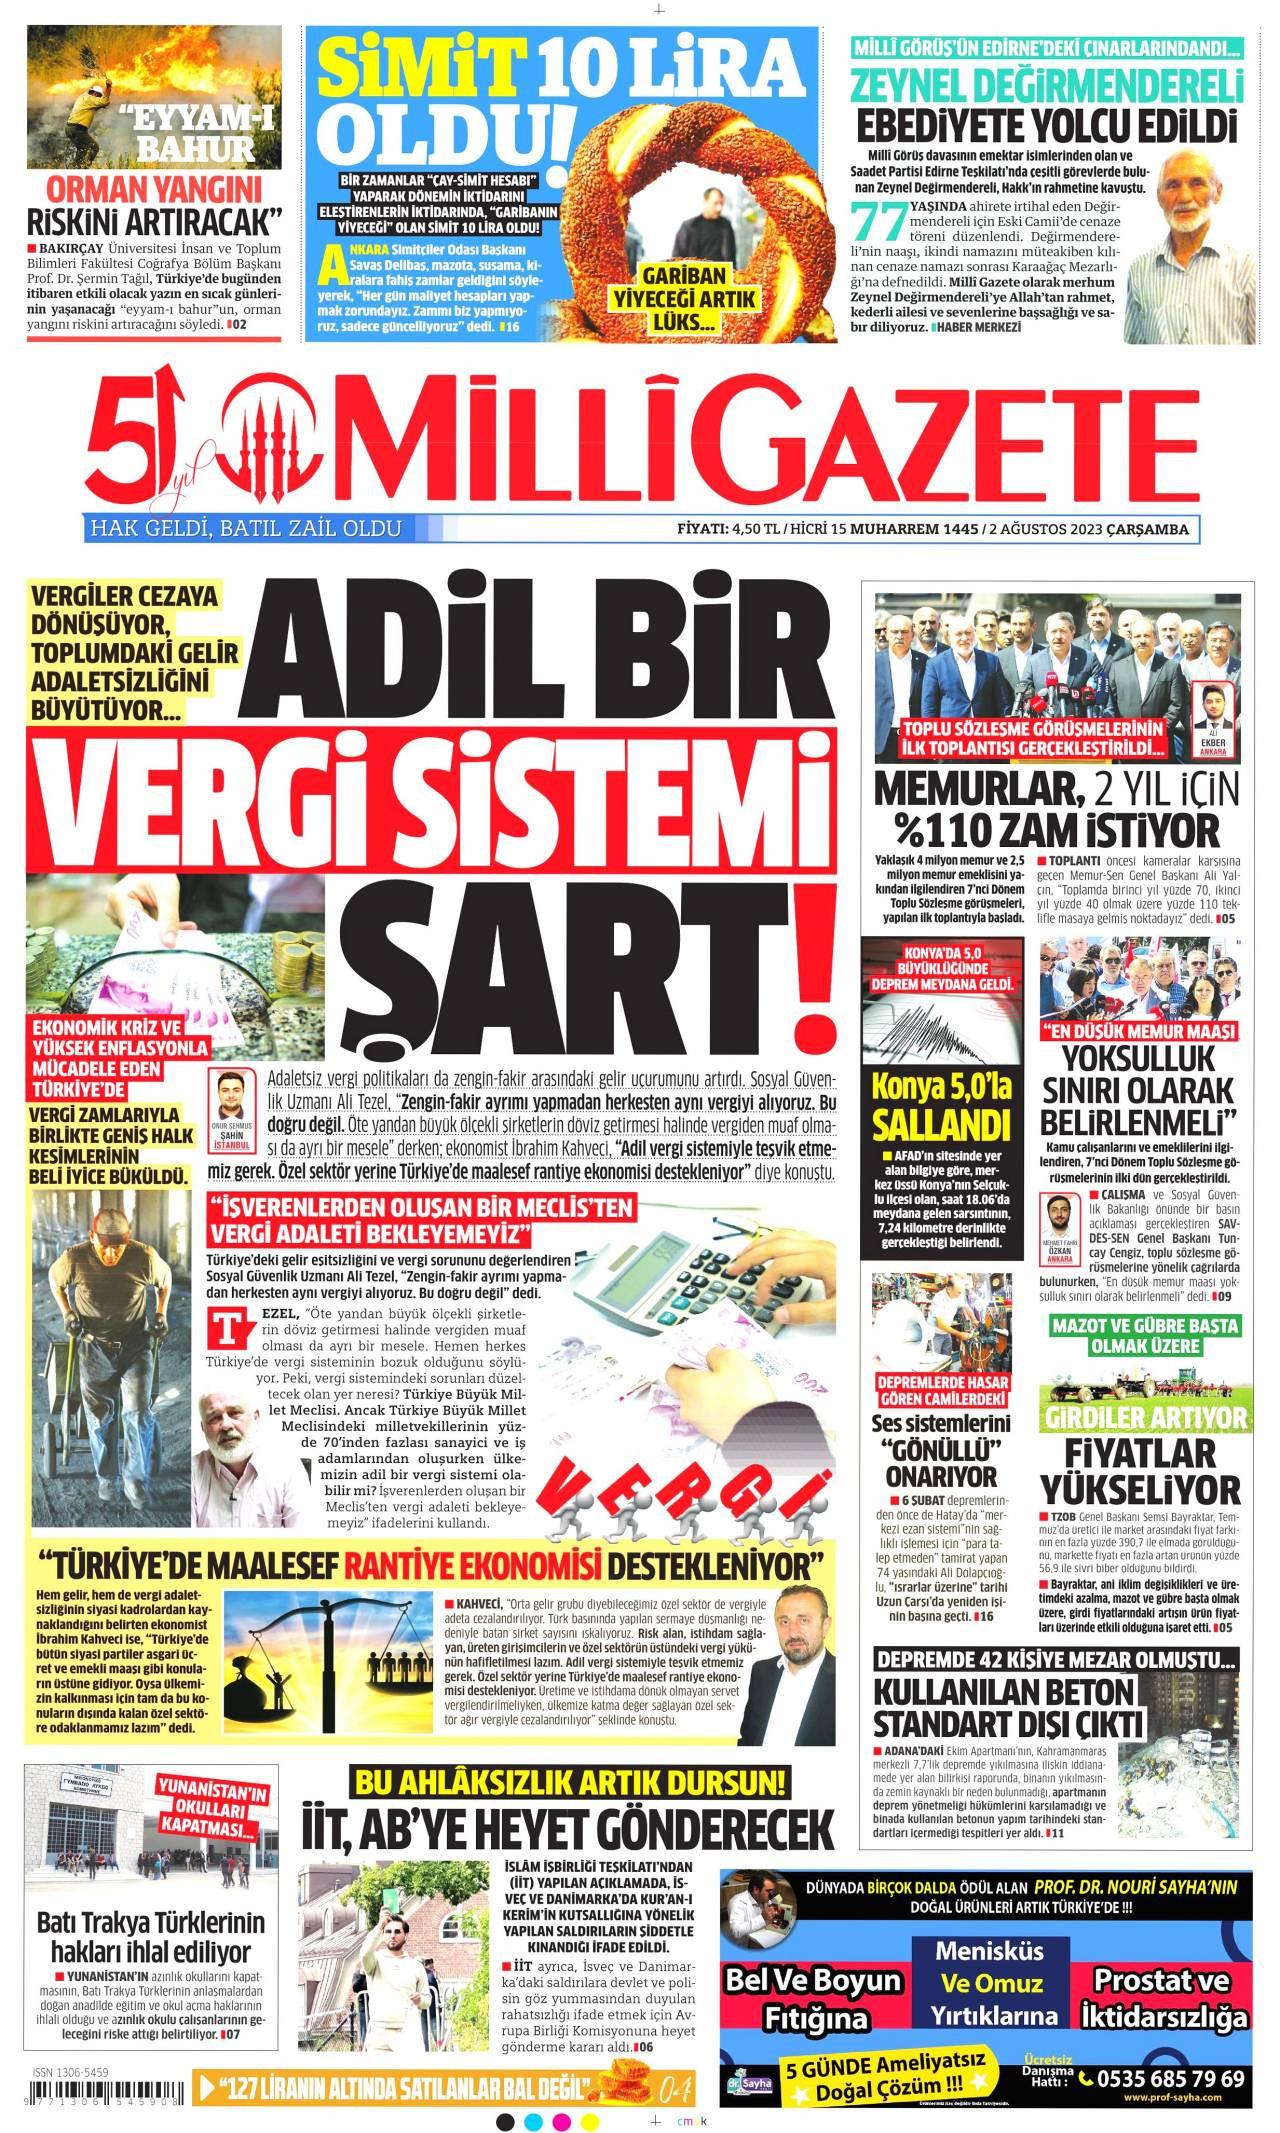 Milli Gazetesi